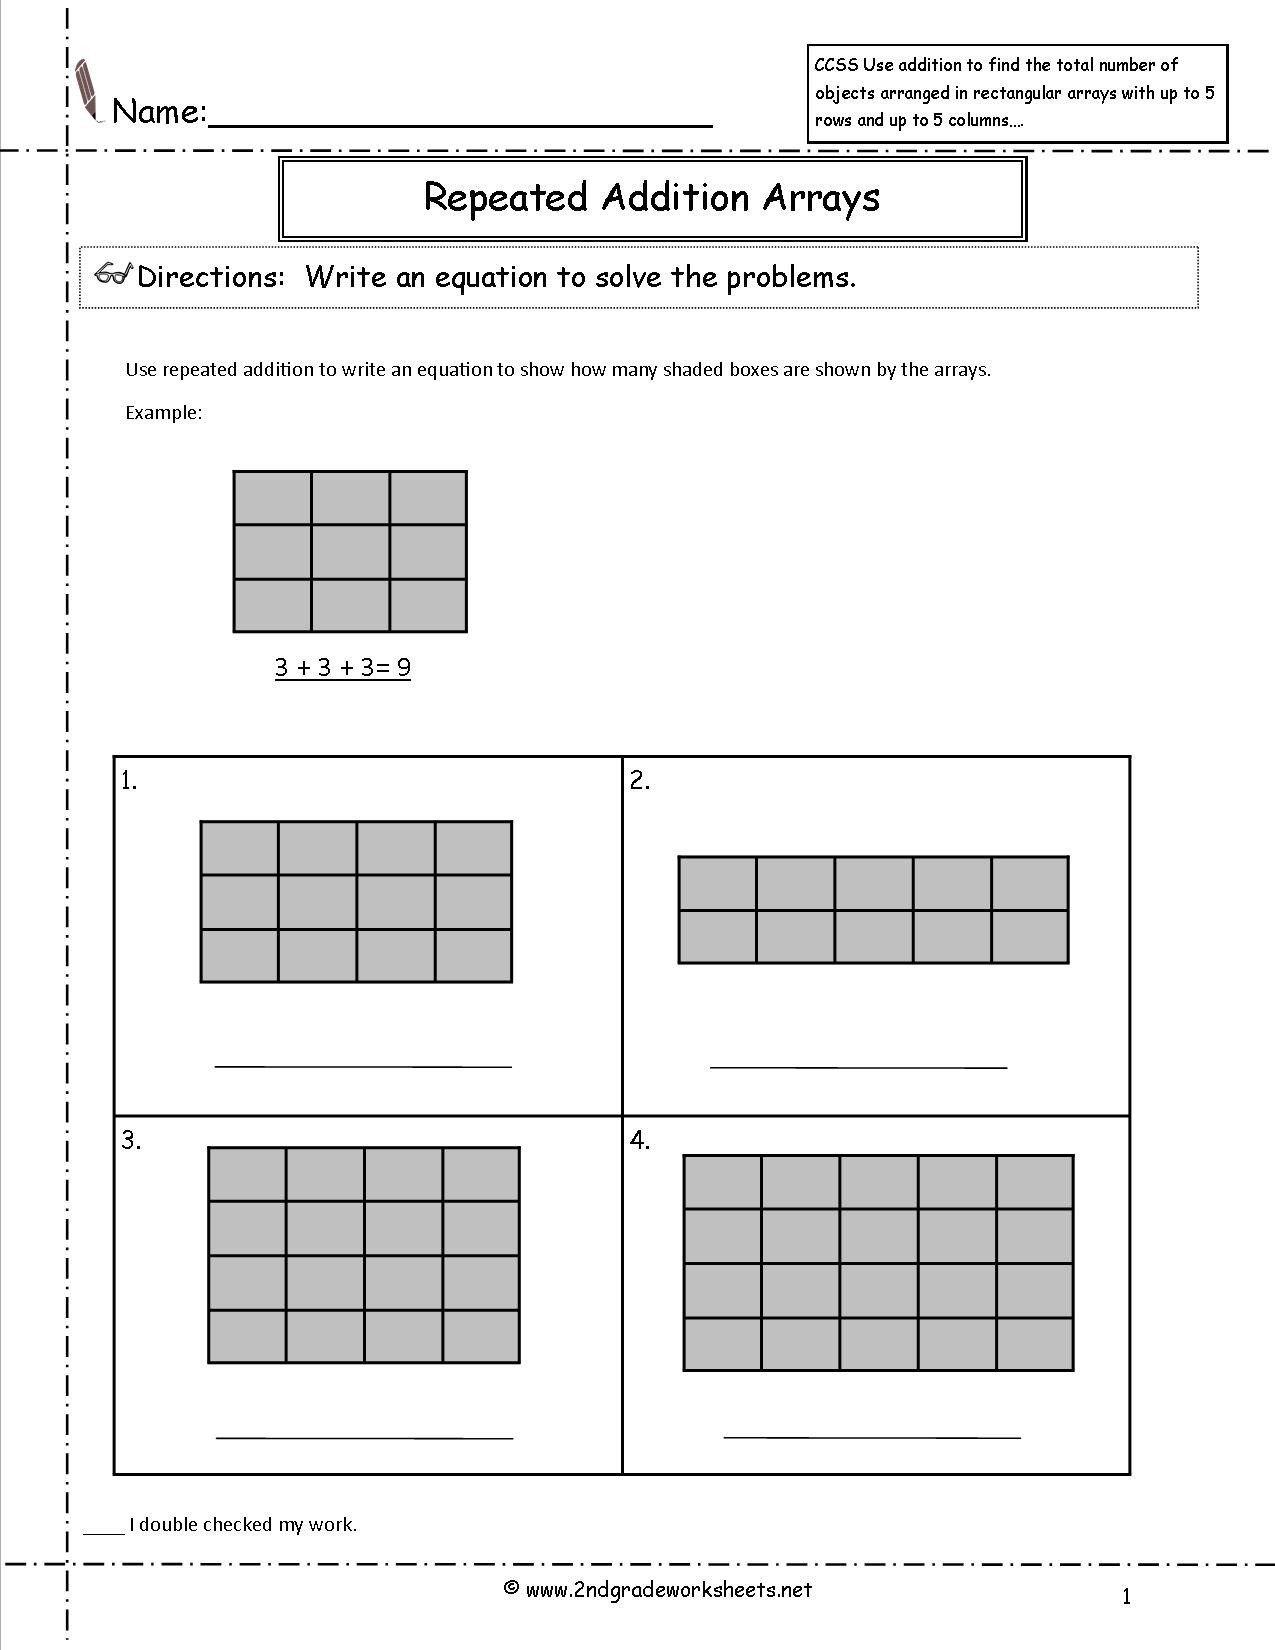 Array Math Worksheets Ccss 2 Oa 4 Worksheets In 2020 Array Worksheets Repeated Addition Worksheets Addition Worksheets